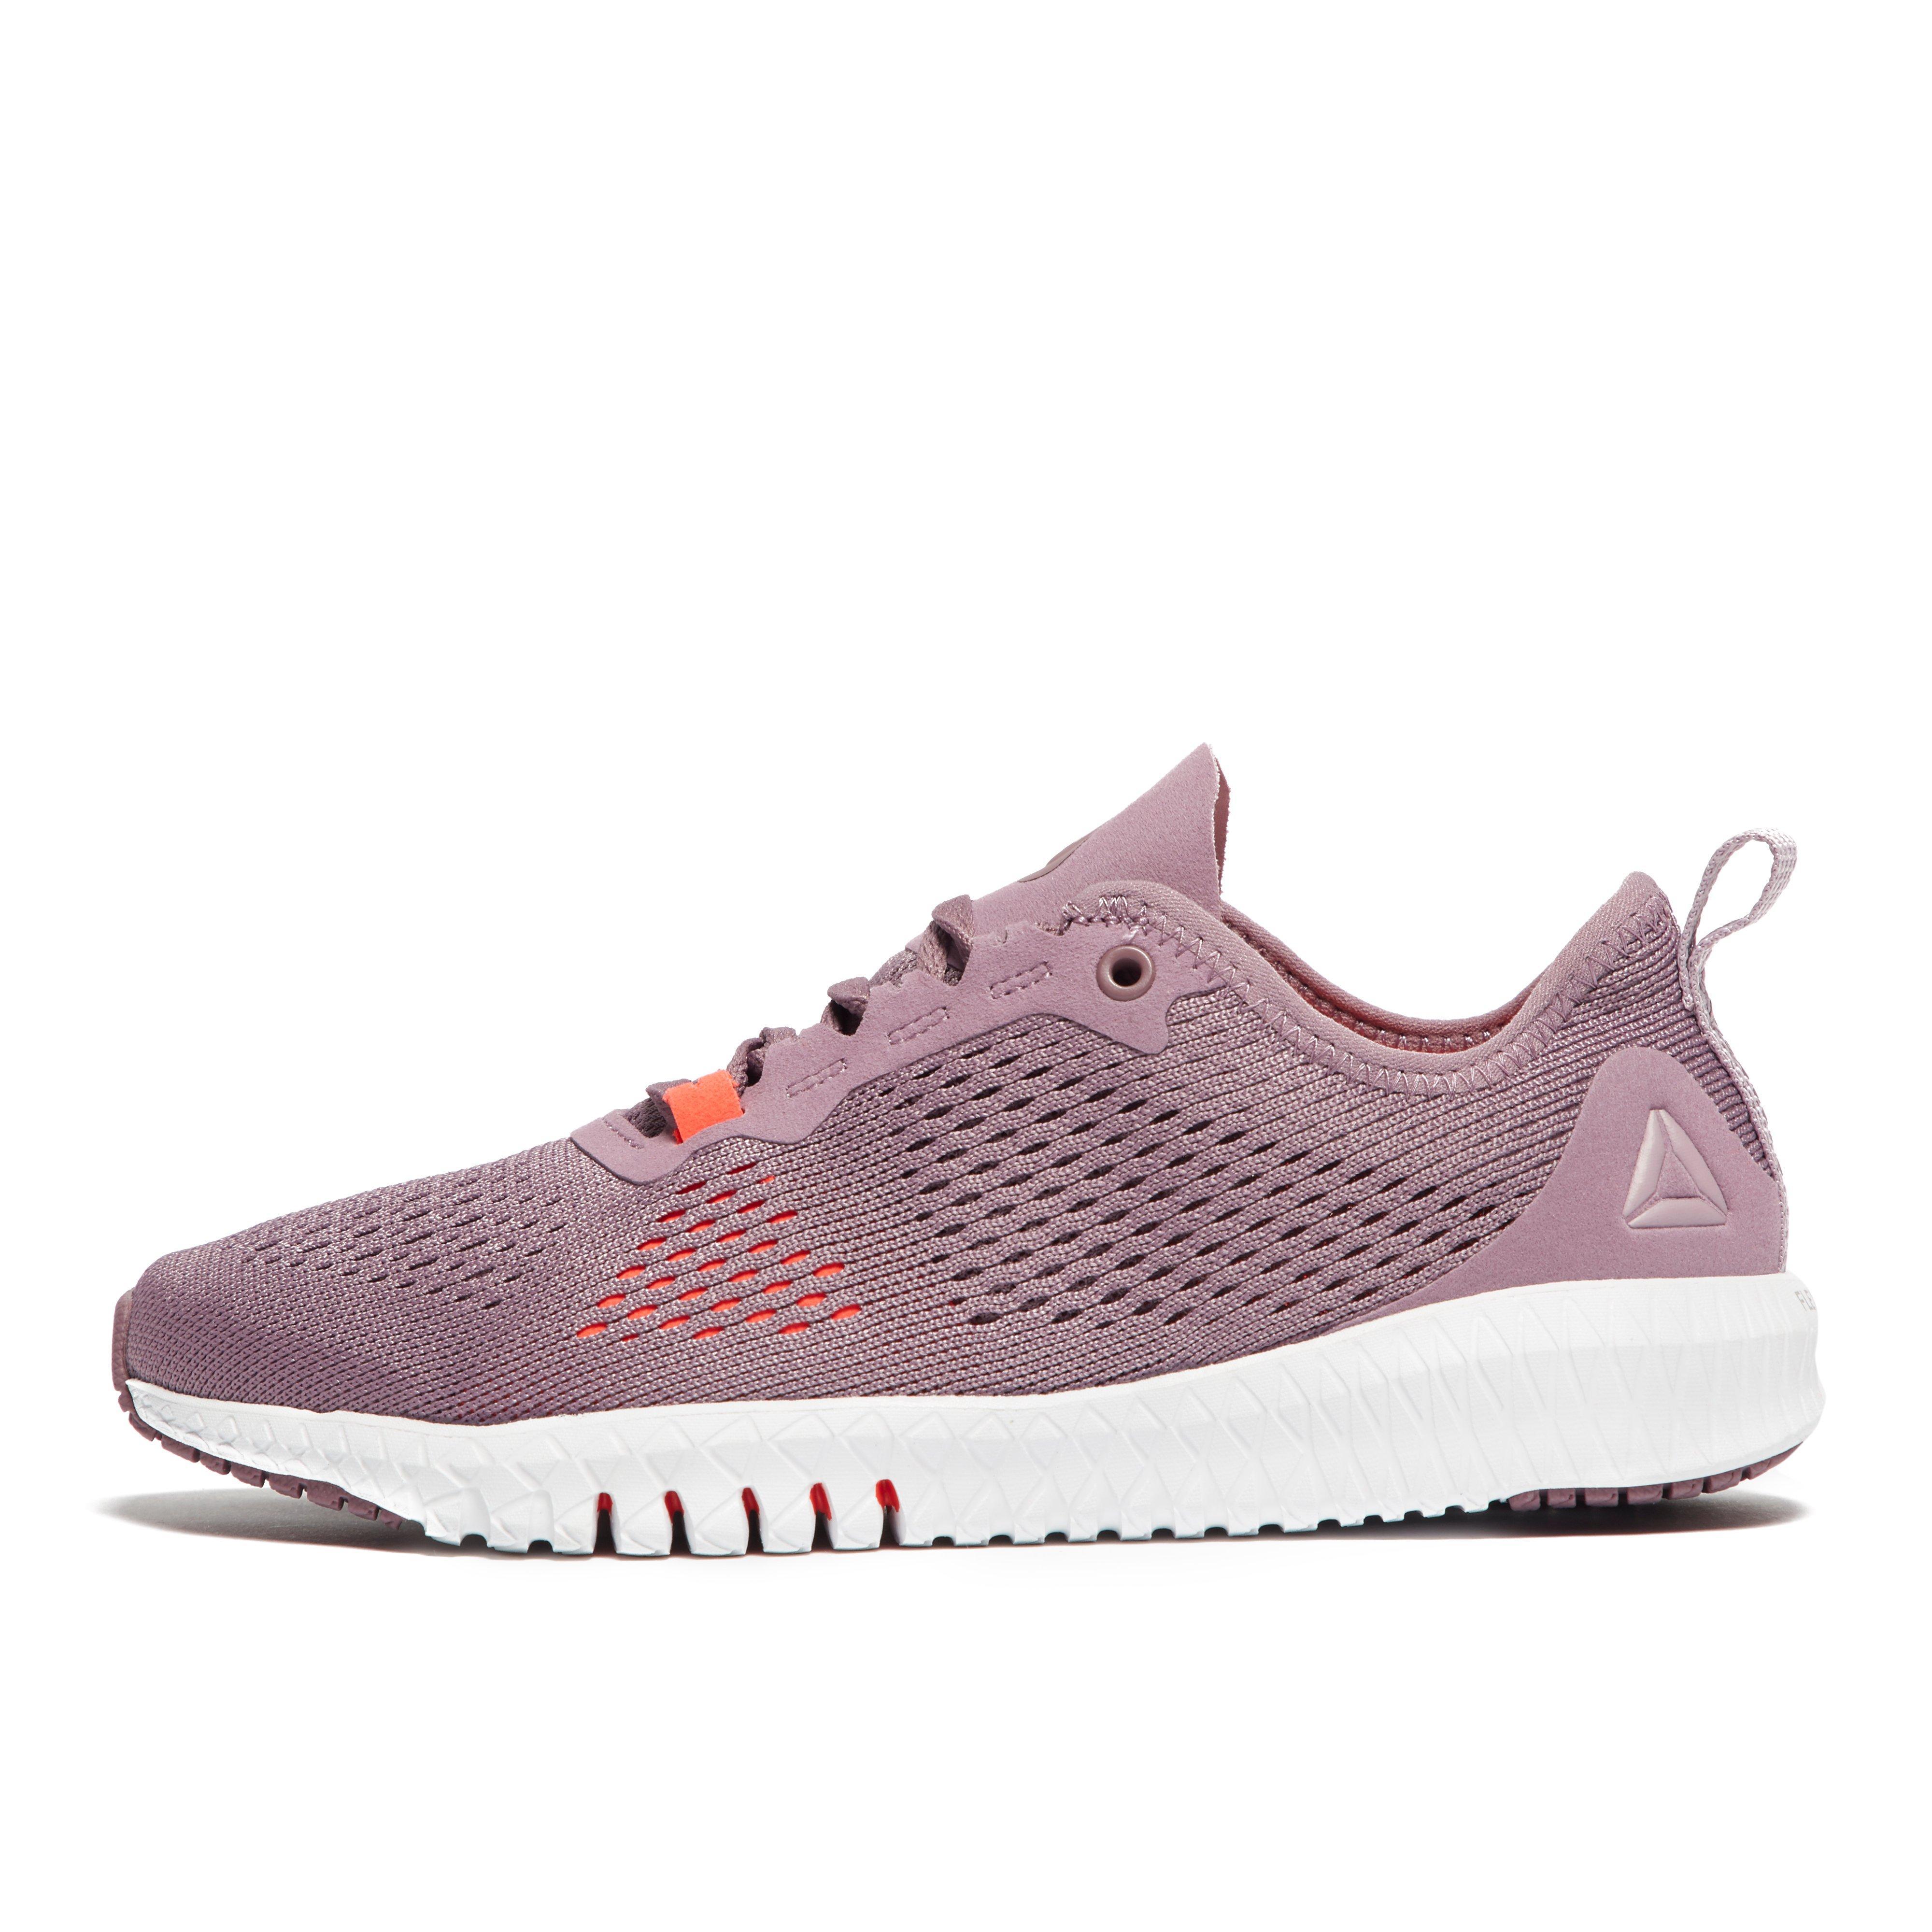 Details about Reebok Flexagon Women's Training Shoes